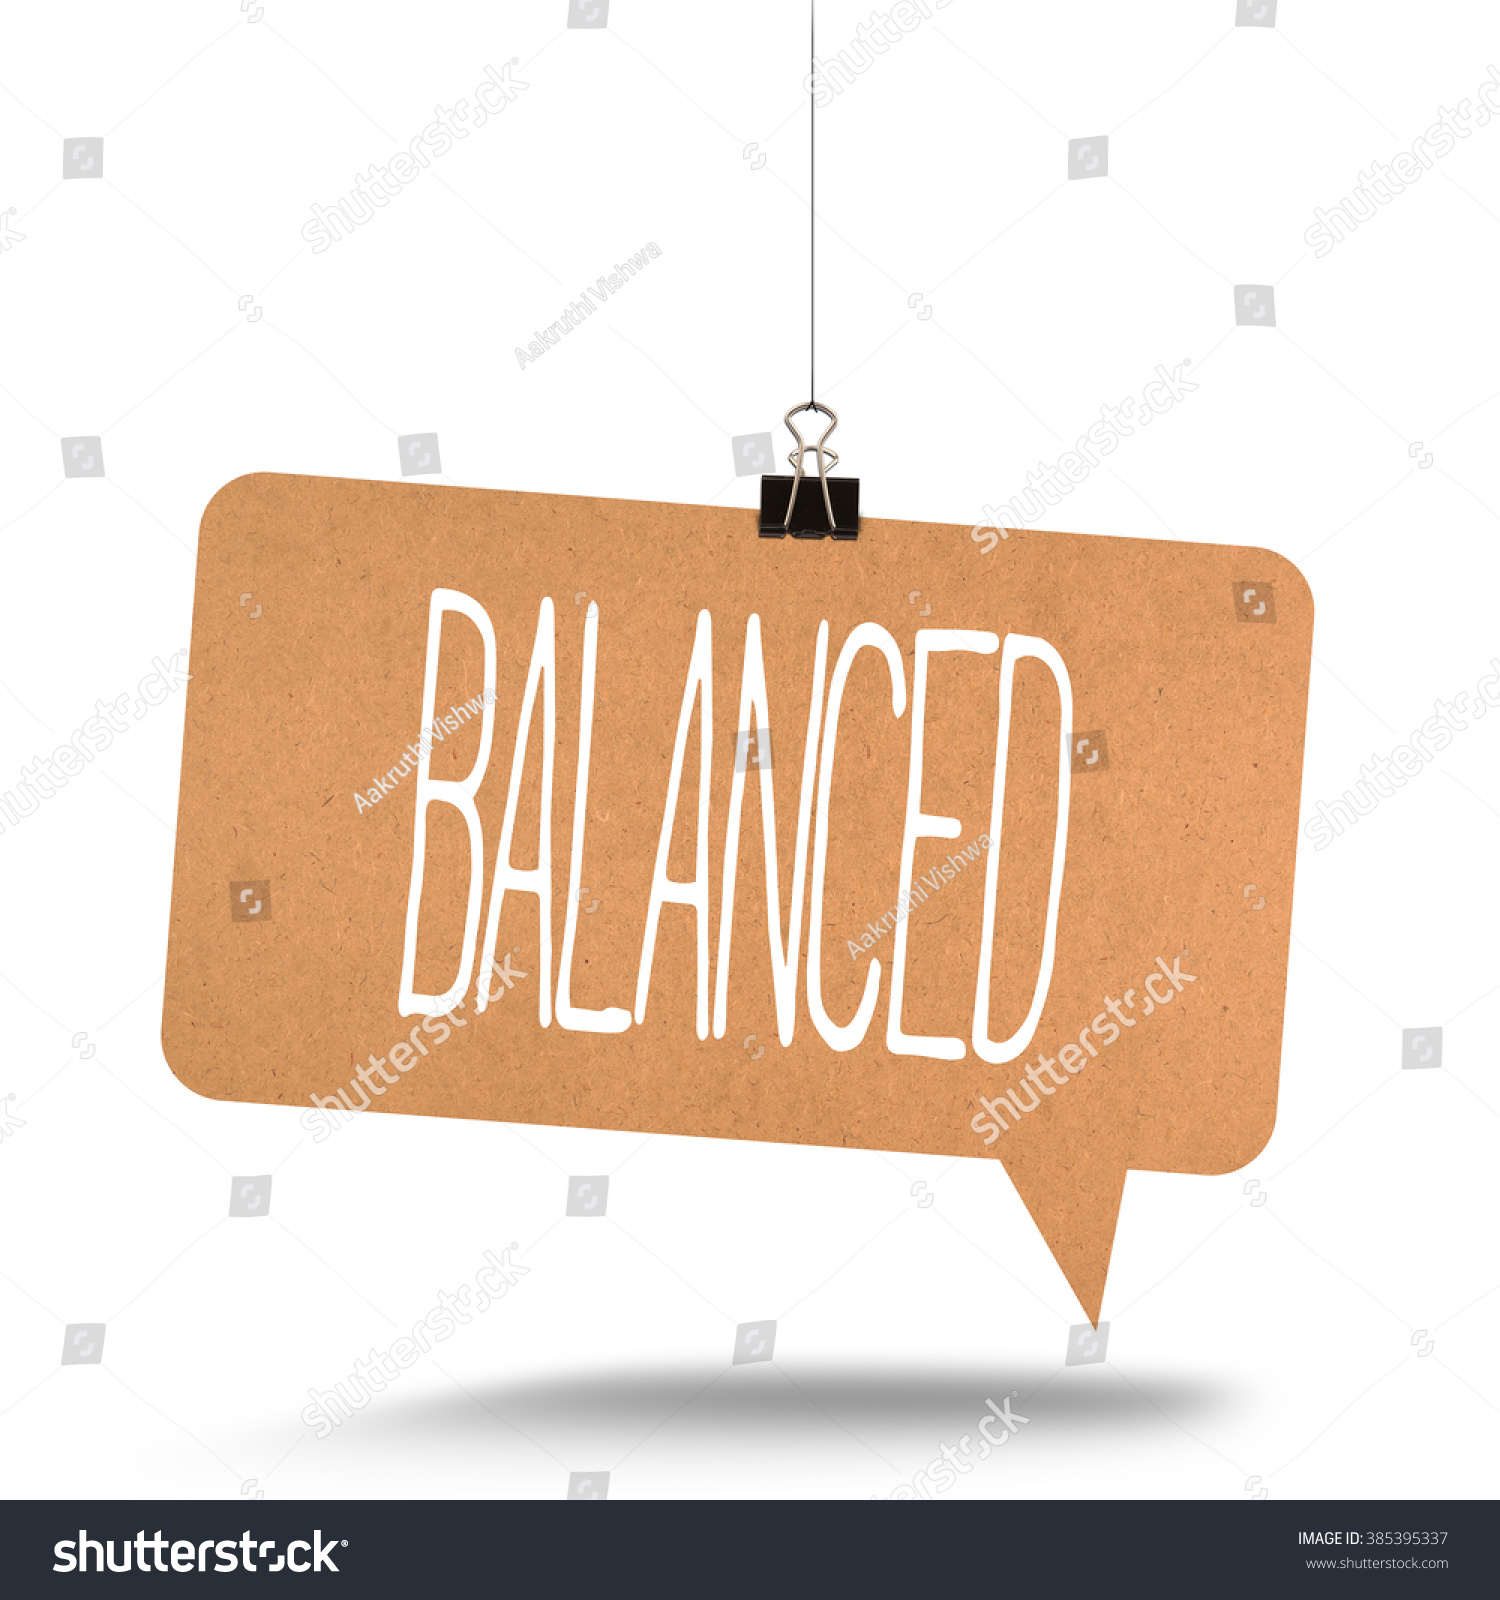 balanced word on cardboard stock photo edit now 385395337